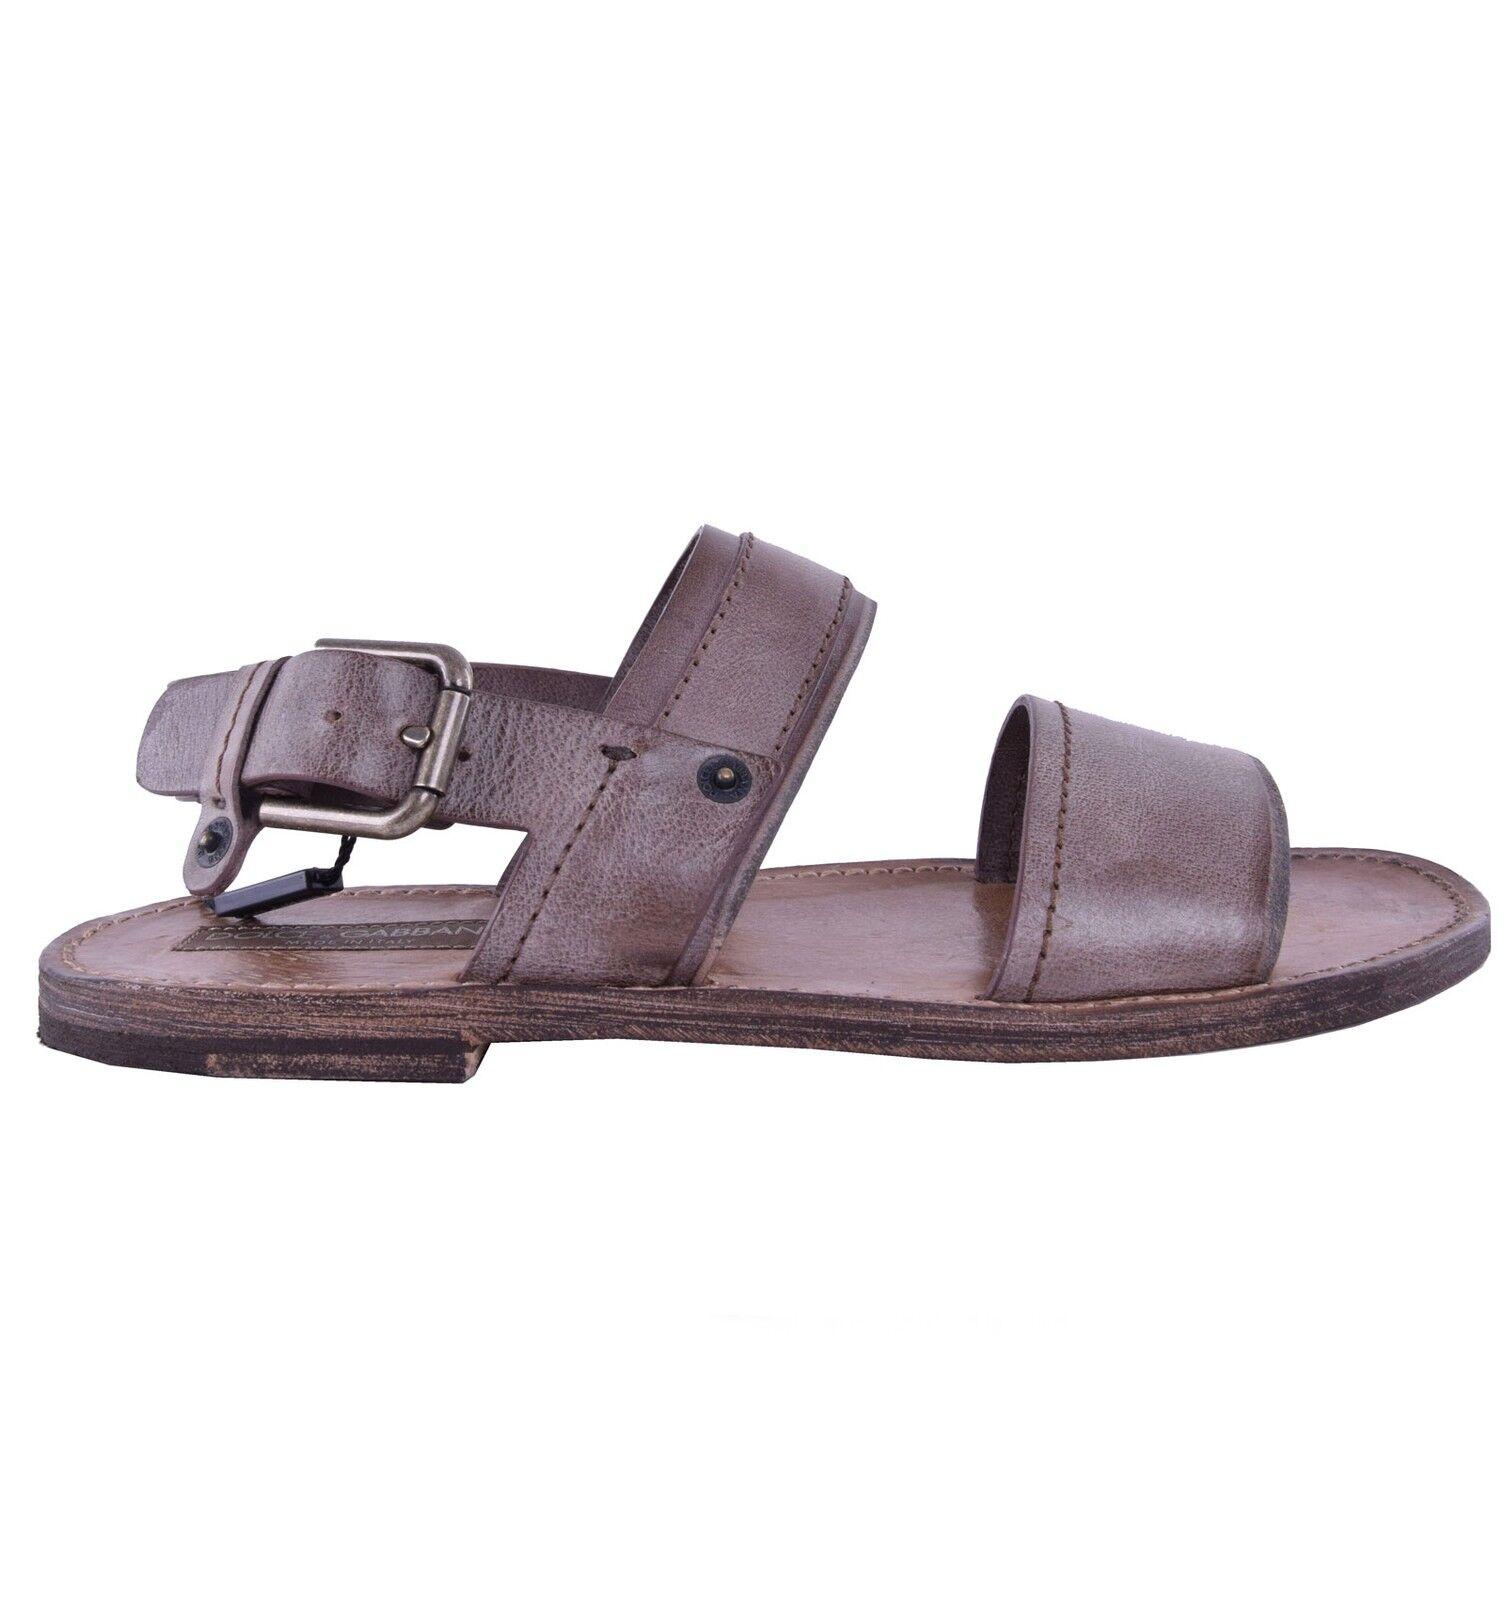 DOLCE & GABBANA Leder Riemen-Sandaleen Schuhe Braun Sandales Braun 04599